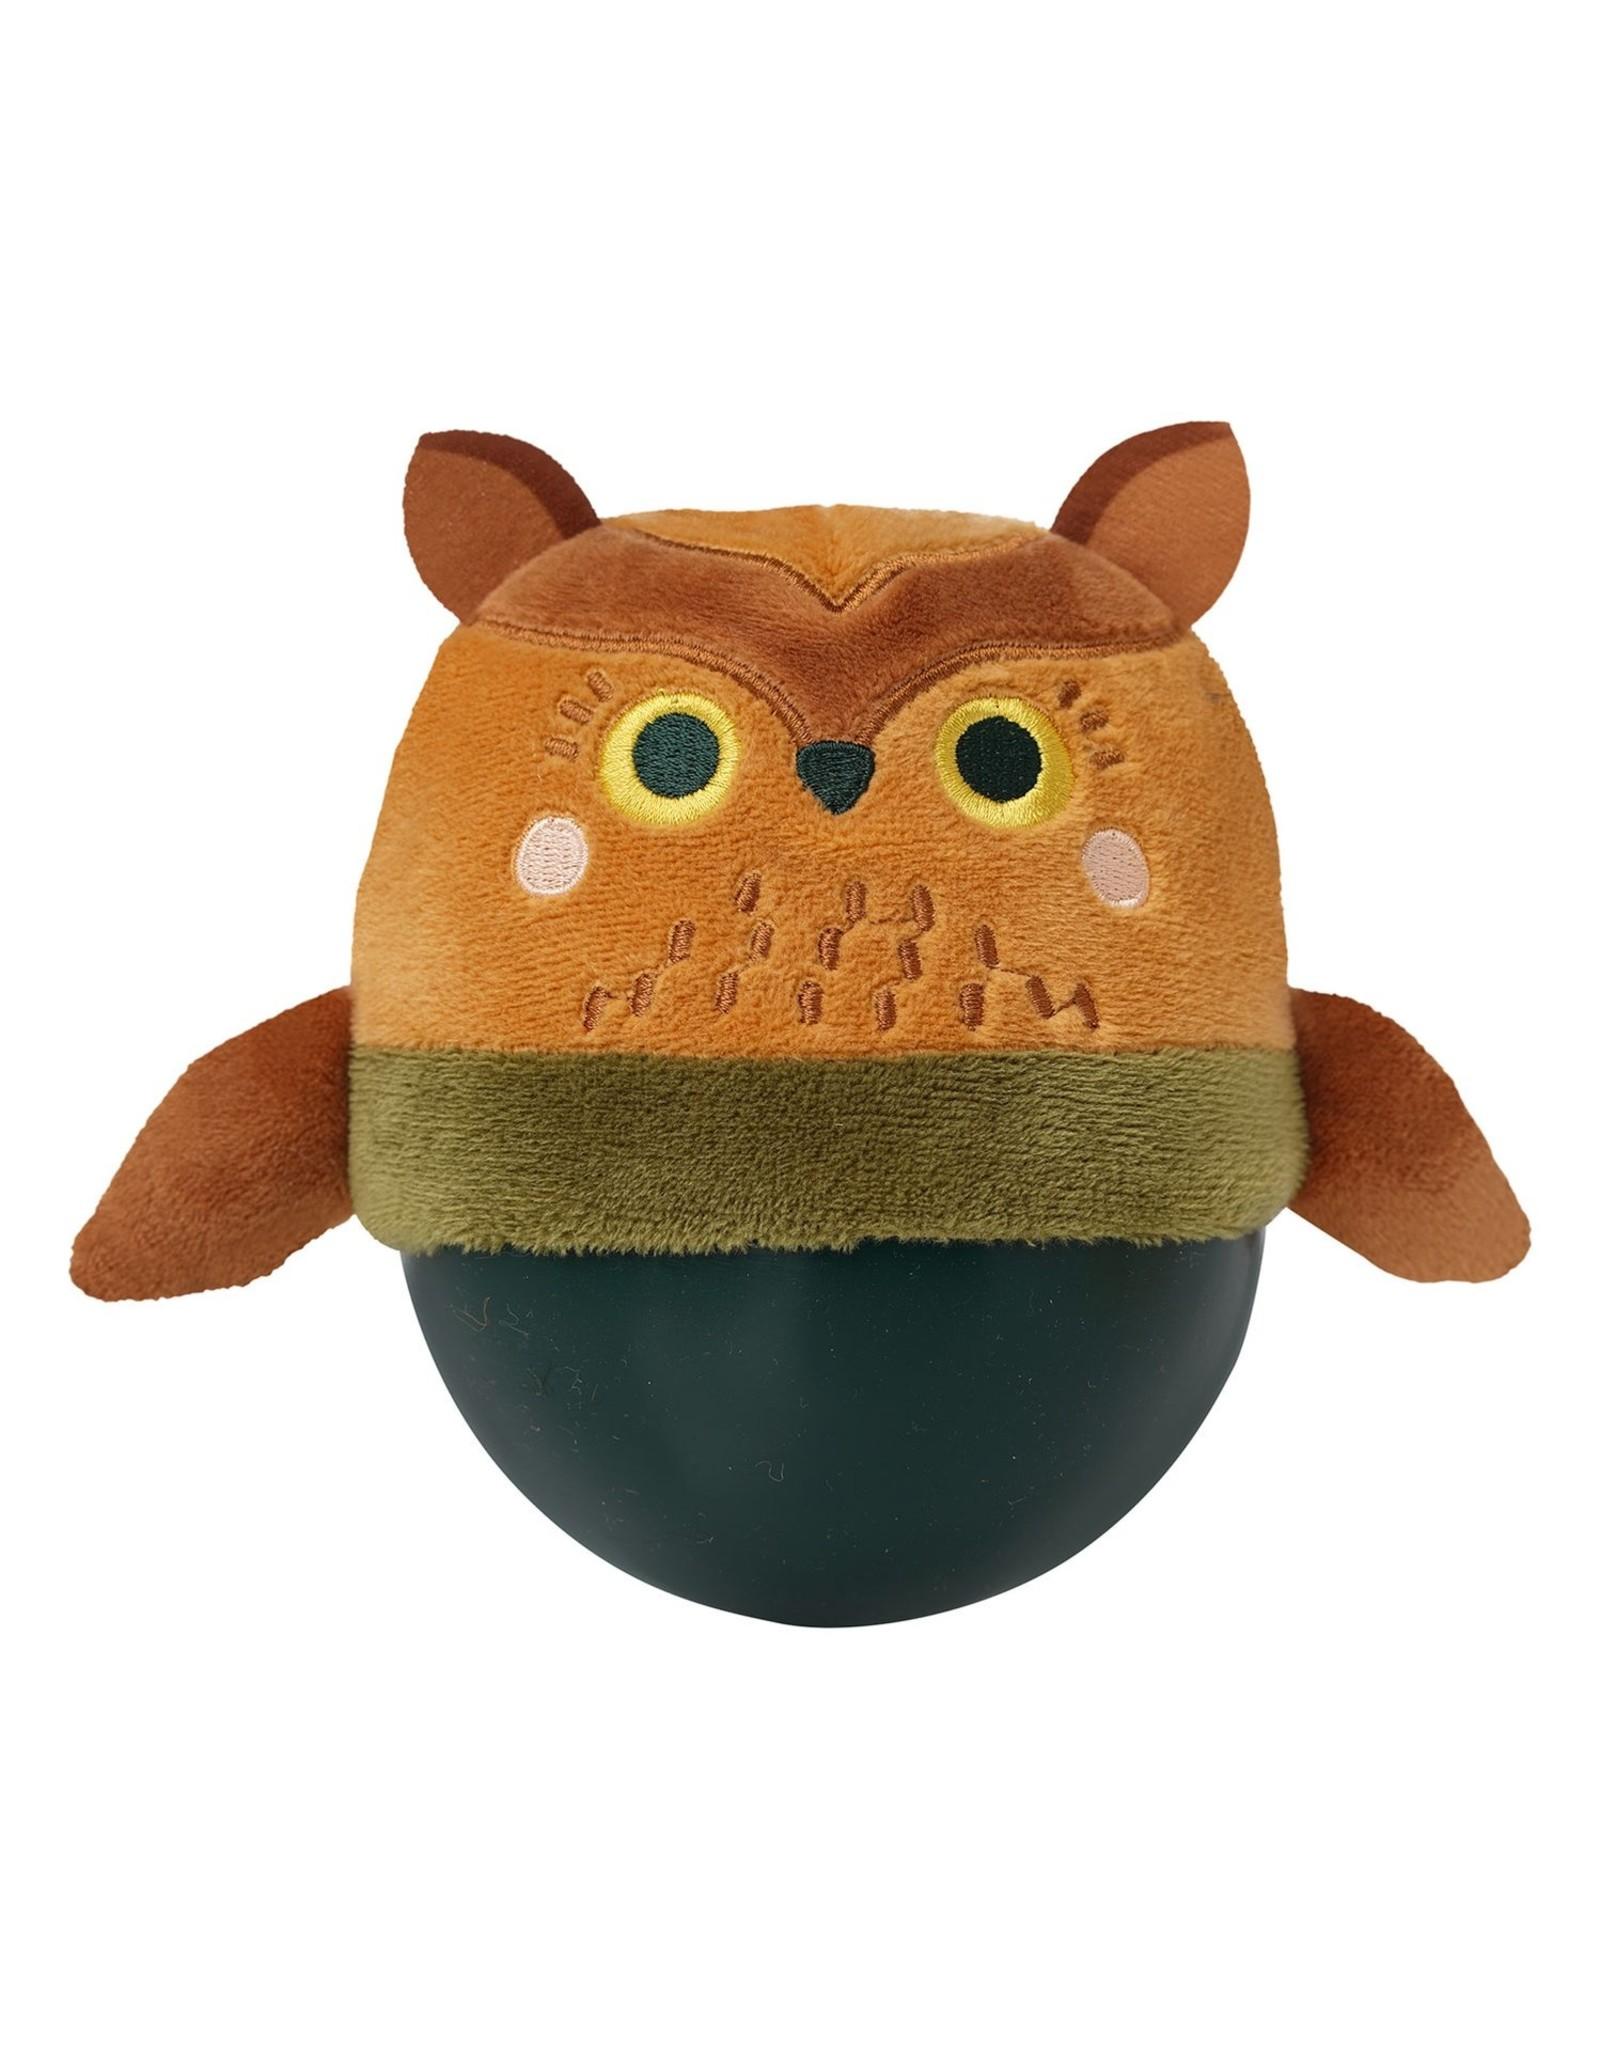 Manhattan Toy Wobbly Bobbly Owl